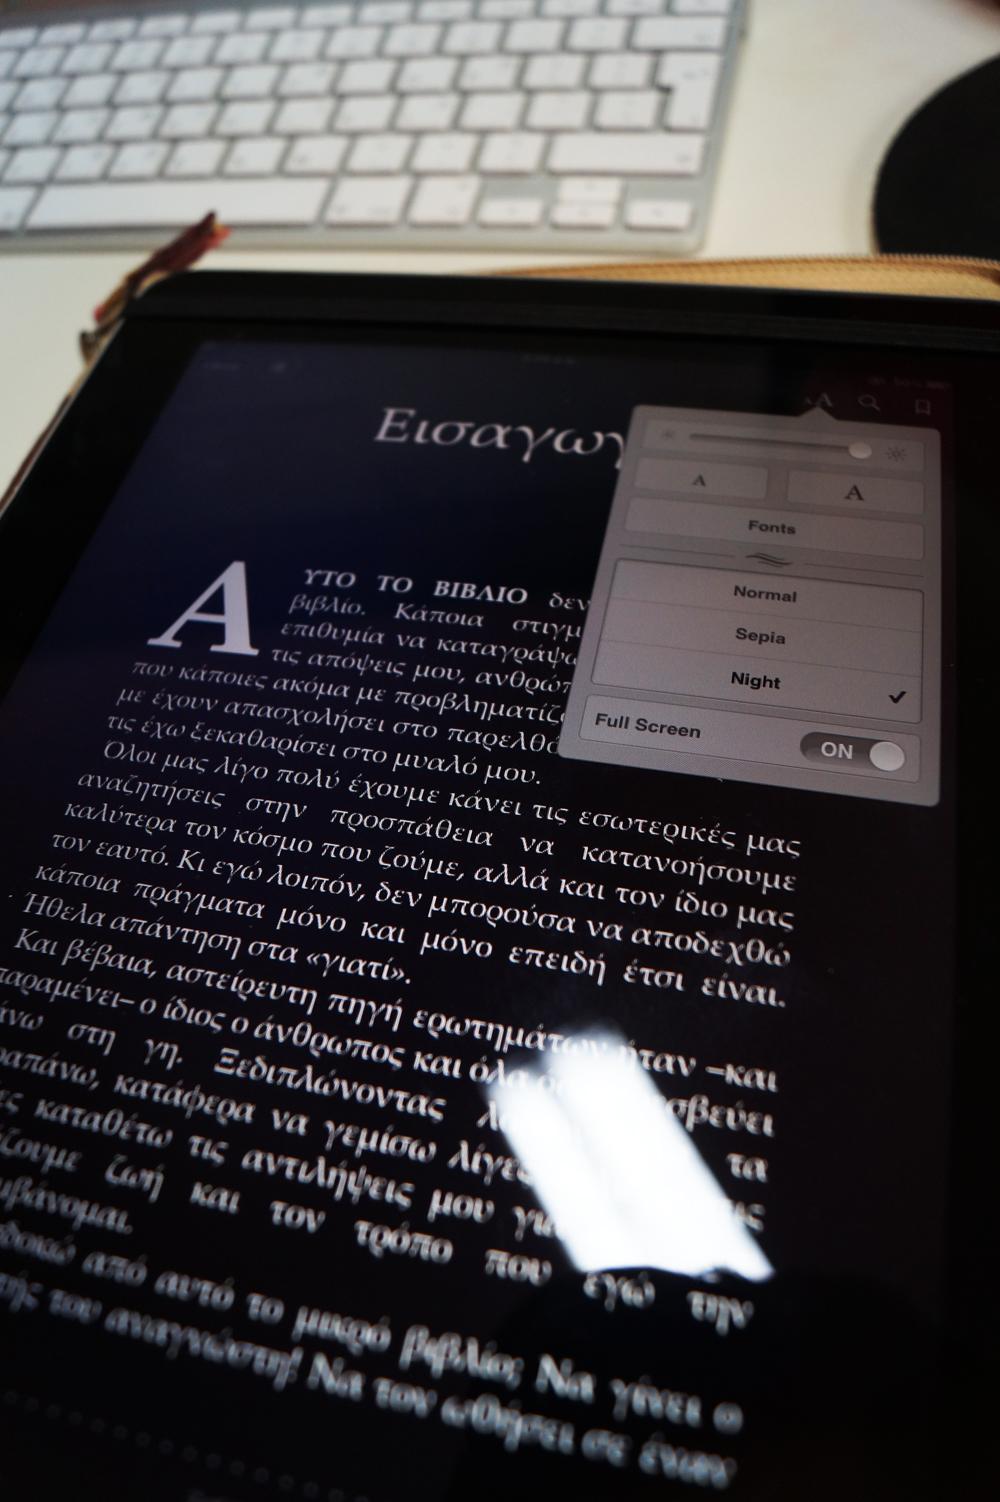 ibook-5